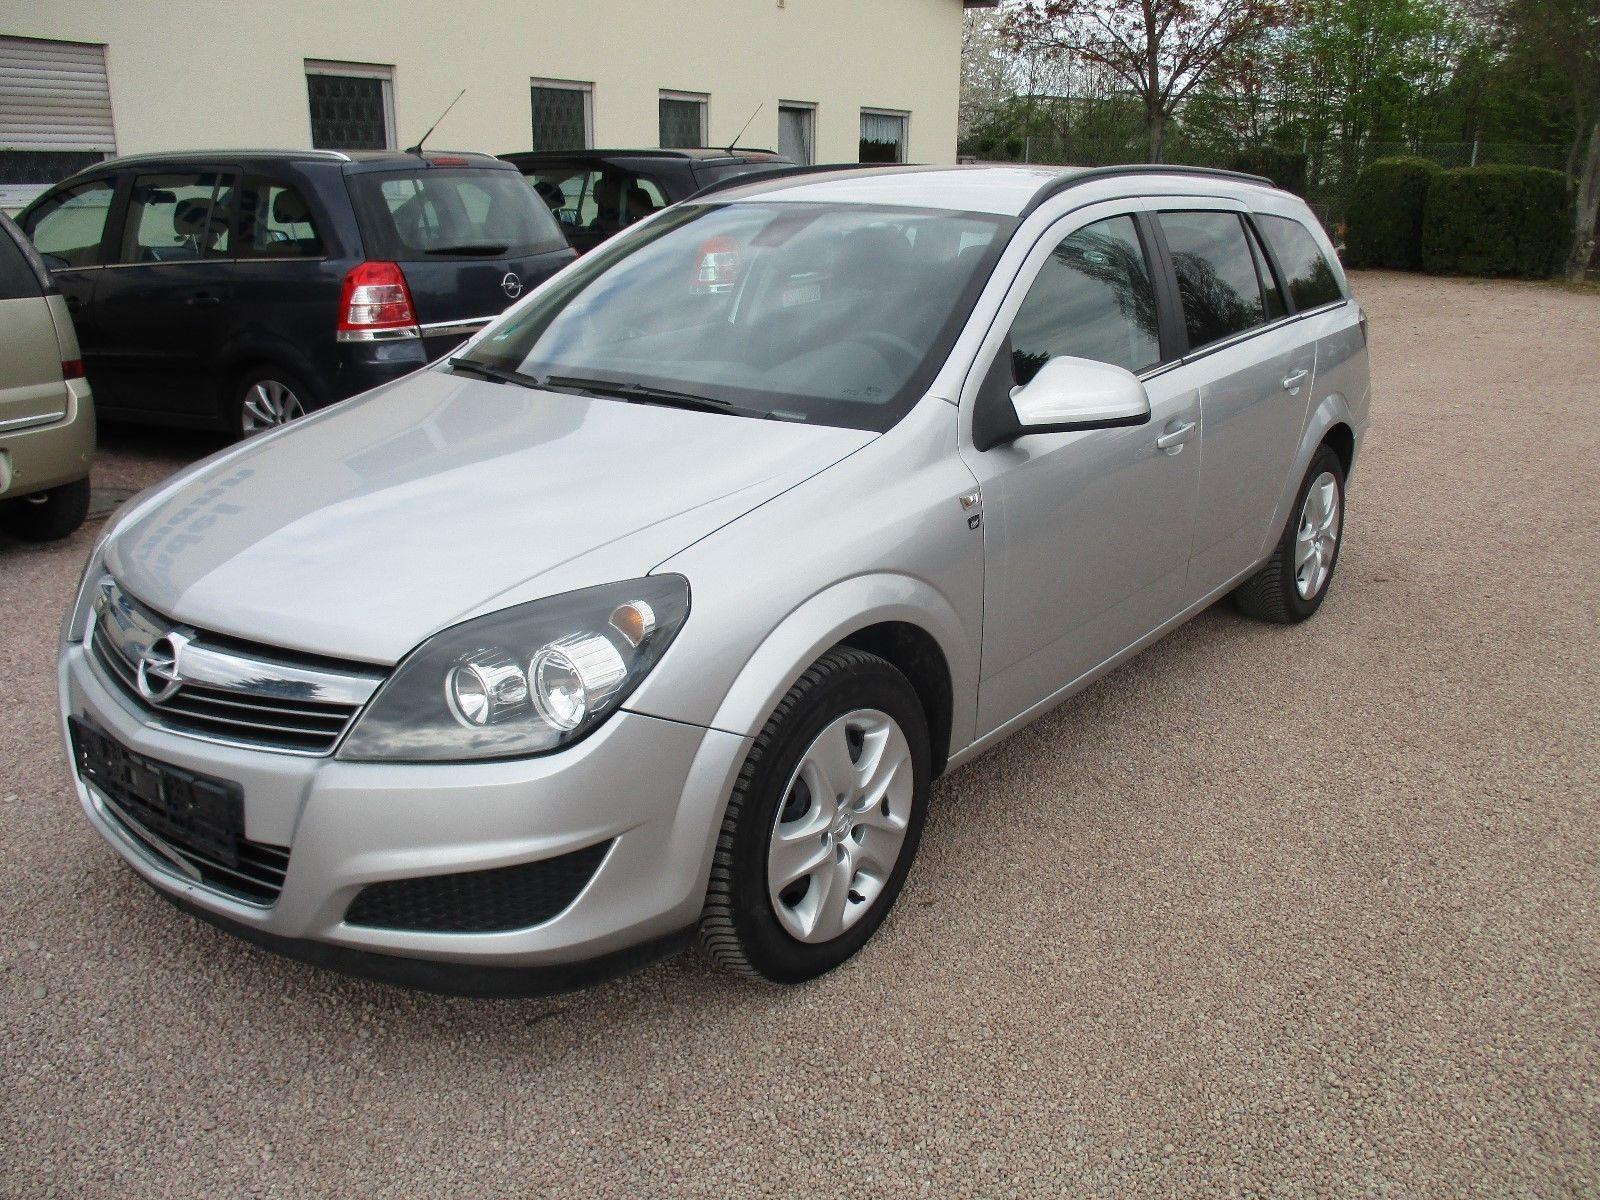 Opel Astra 1 7 Cdti Caravan Dpf Edition 111 Ev Mint Egy